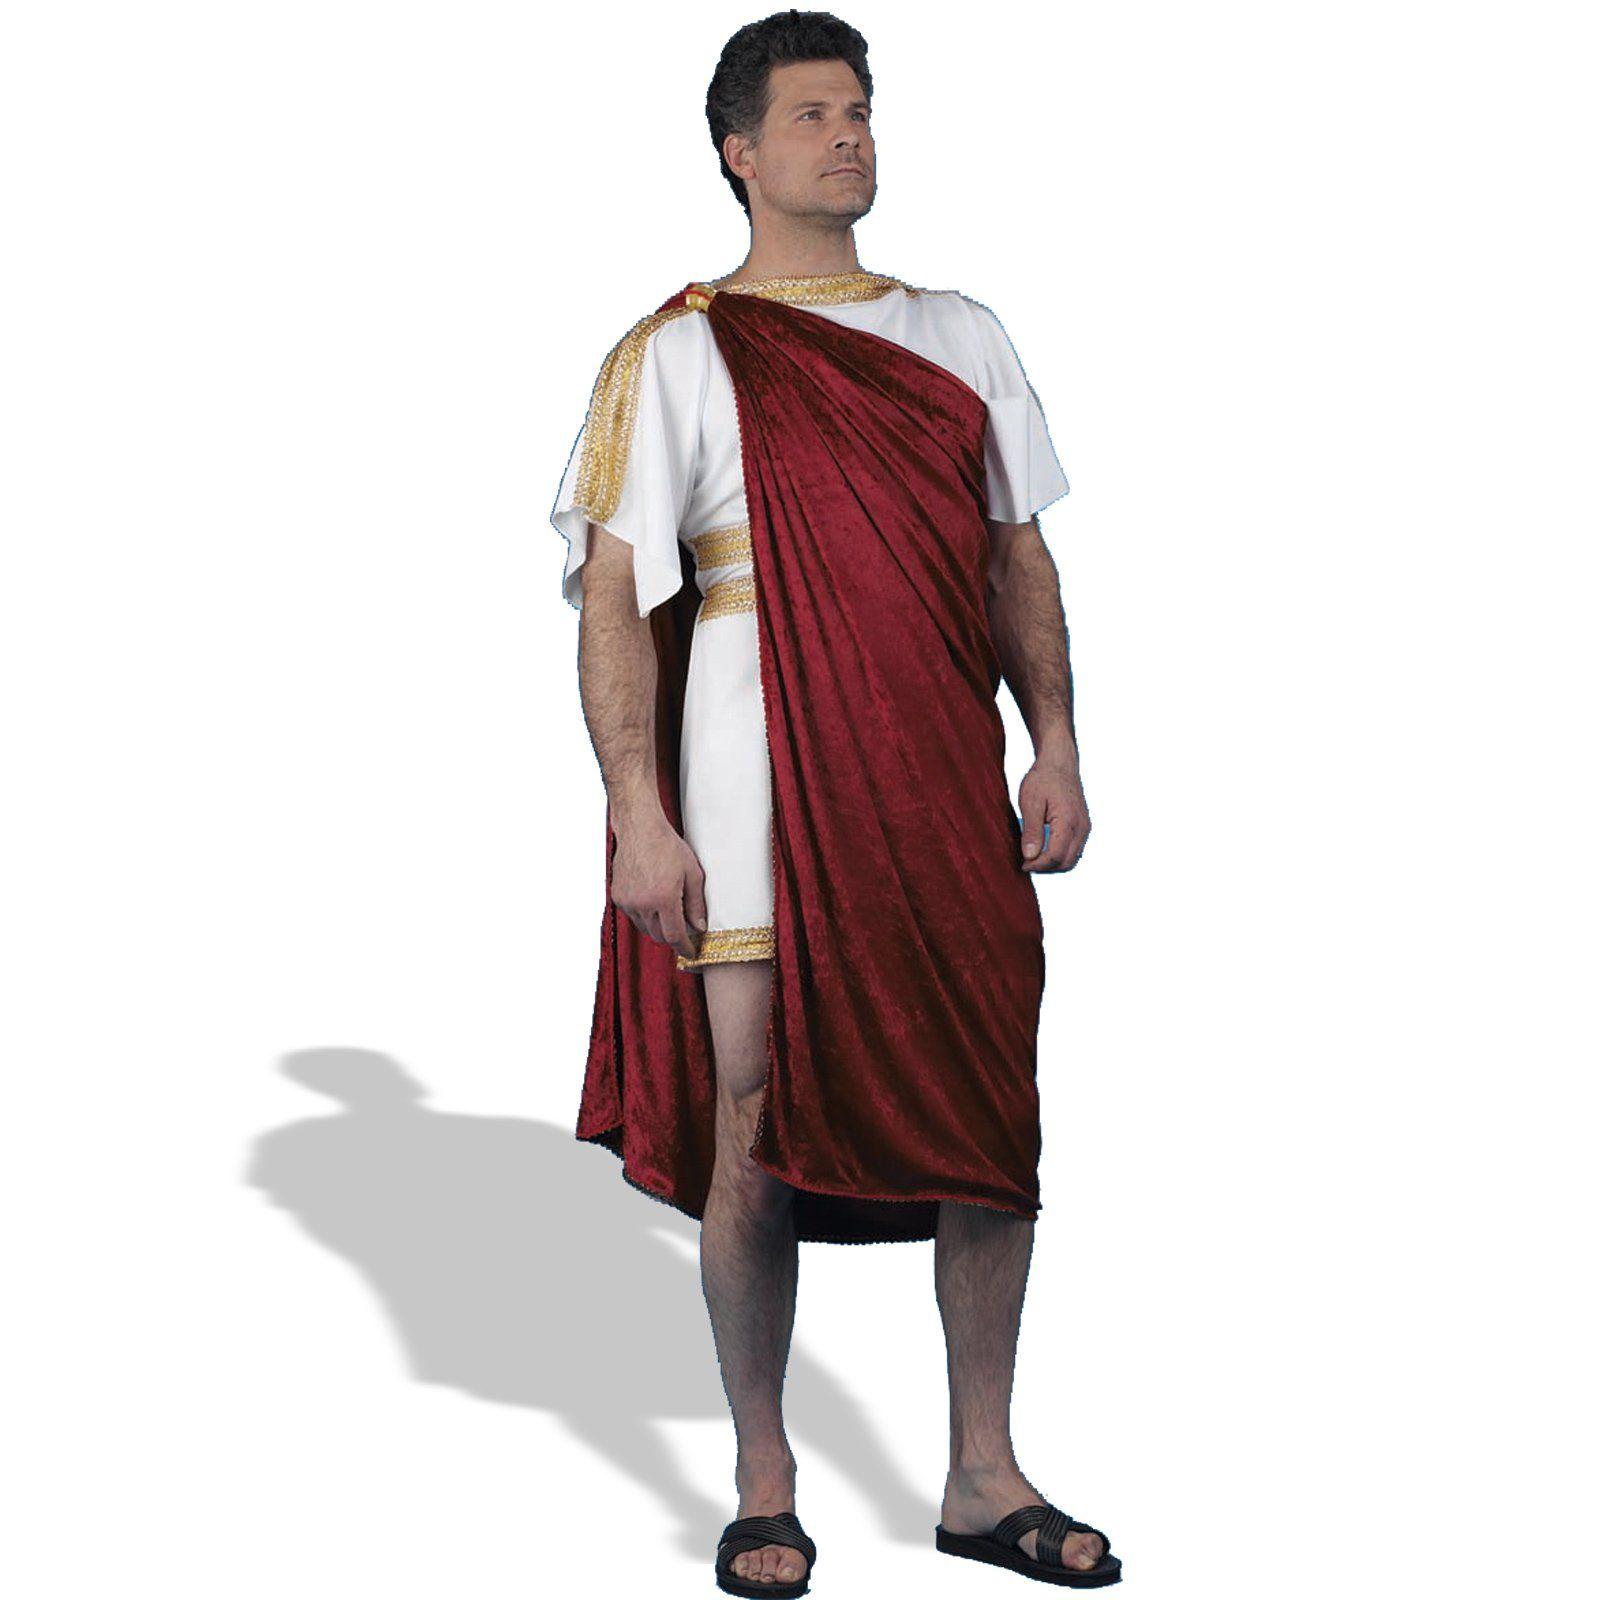 Ancient greek fashion for kids